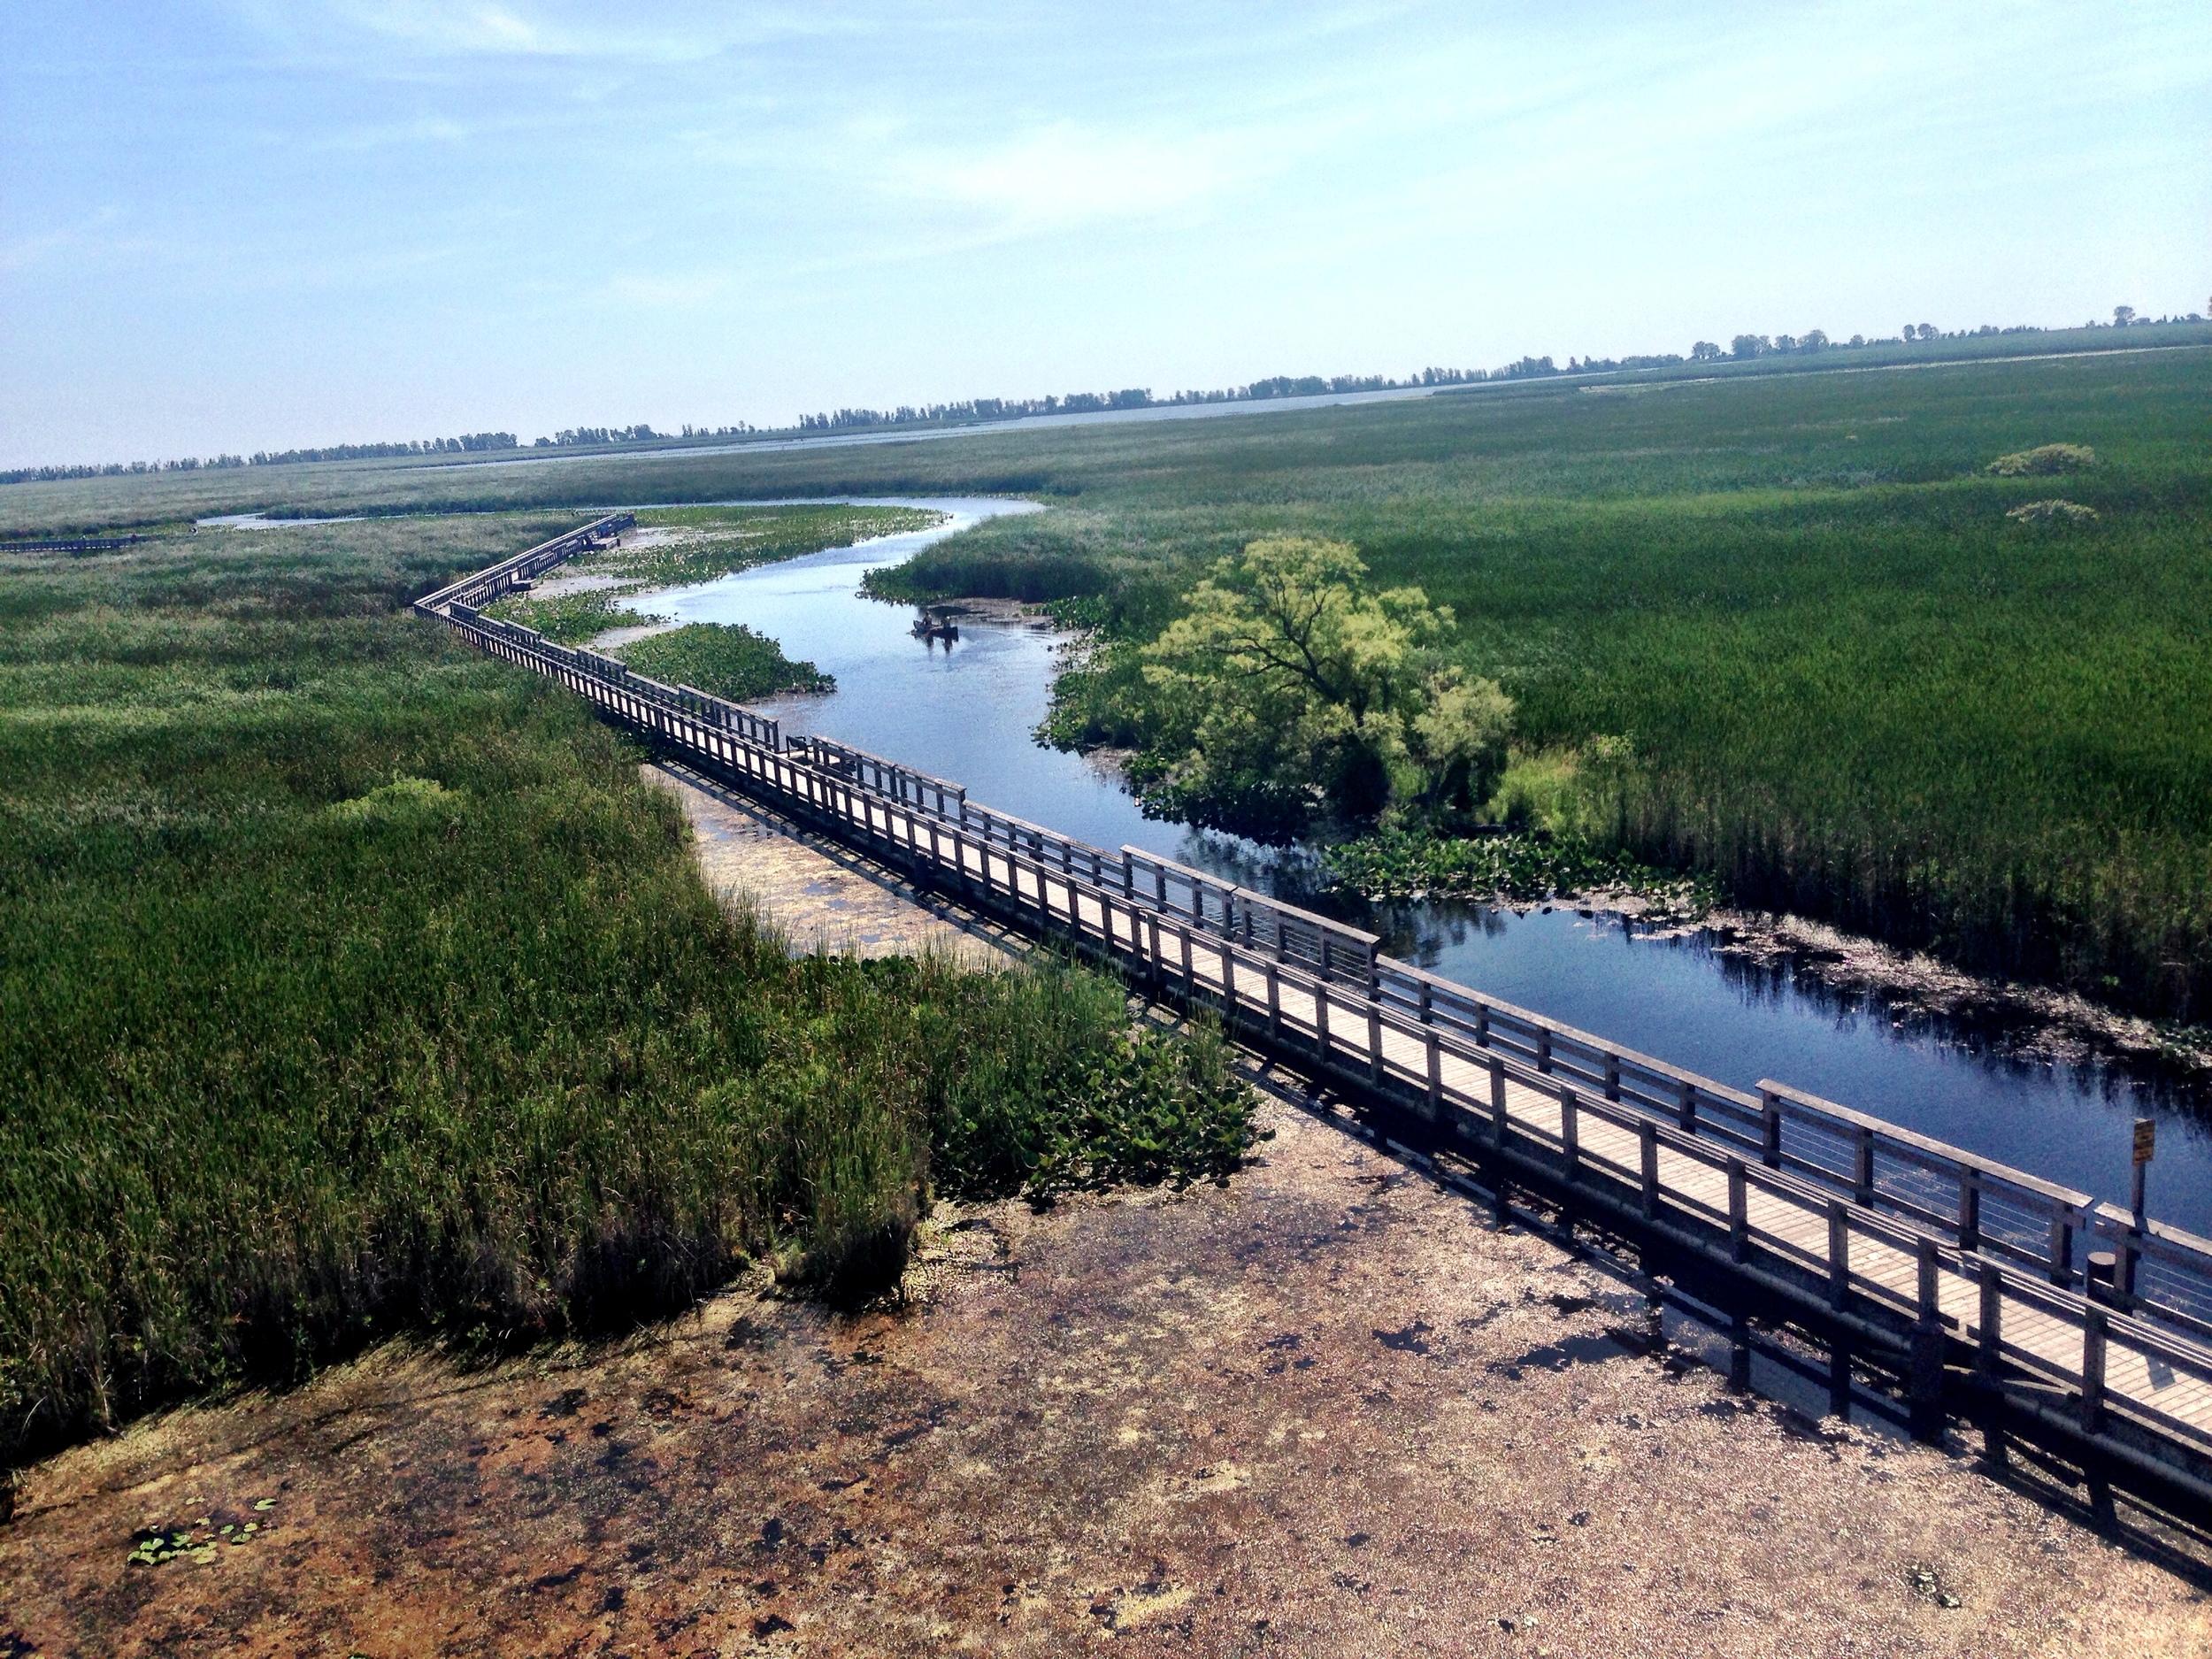 Don't miss the walk through the marsh